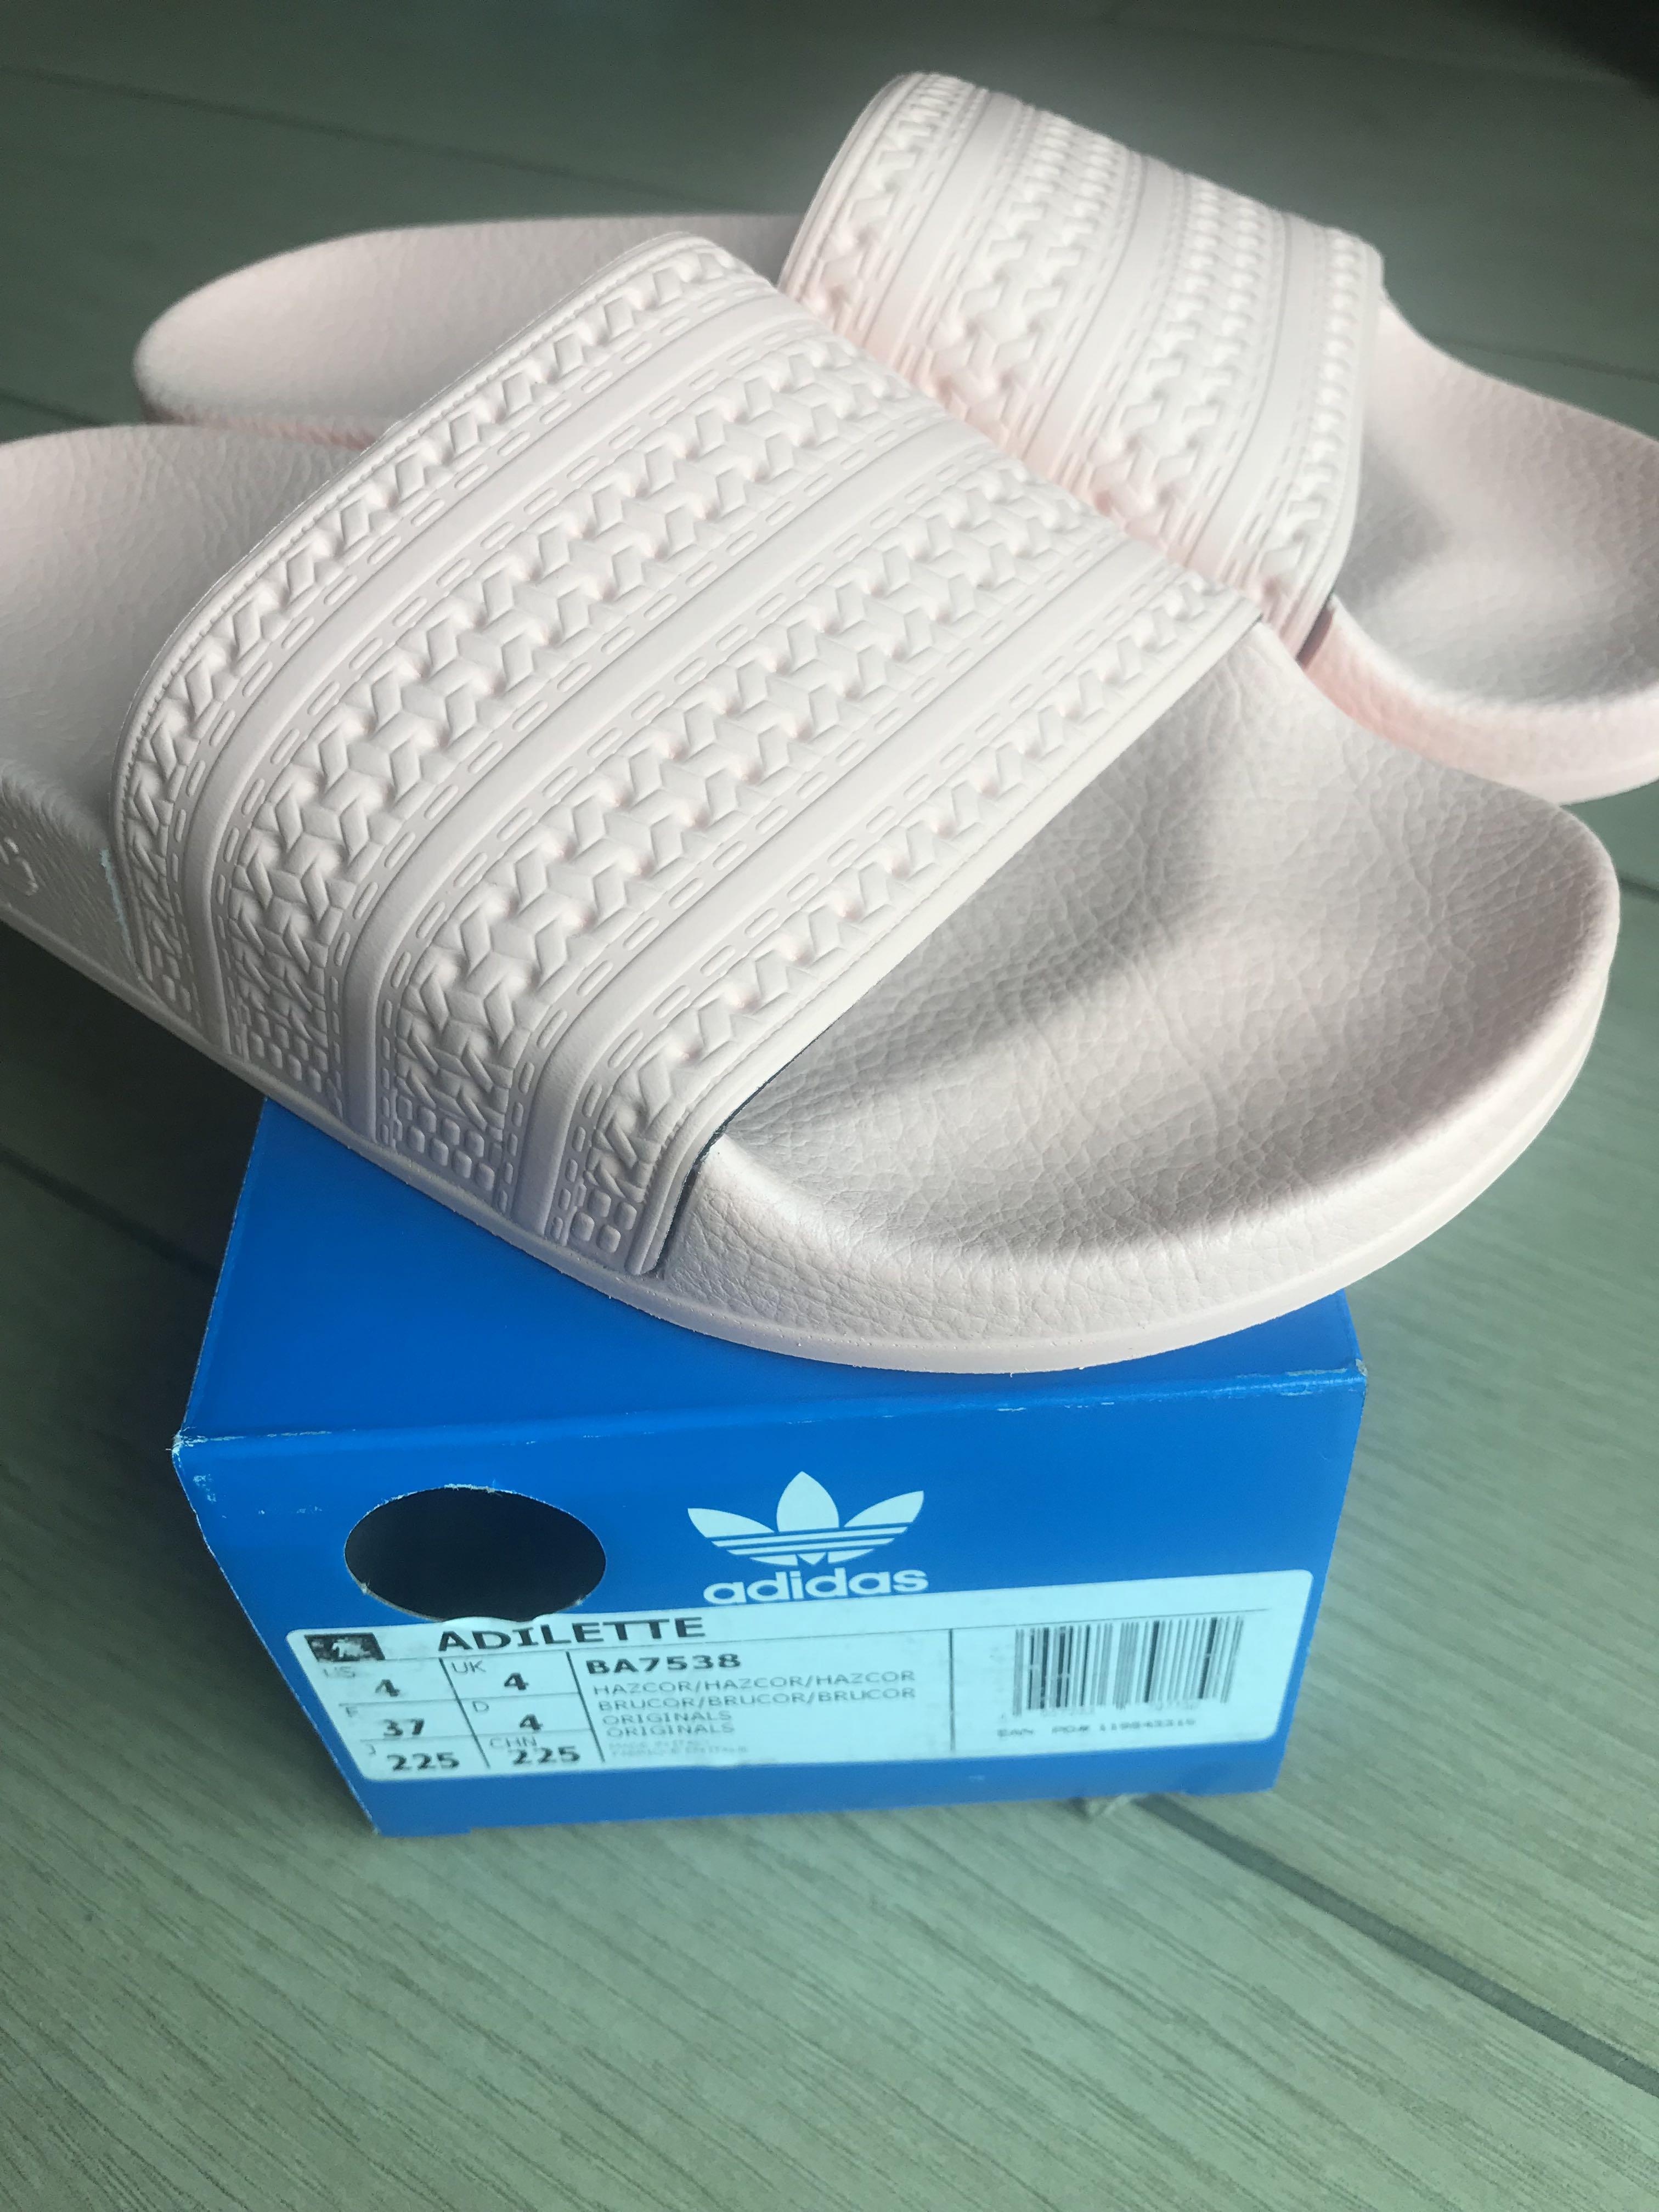 1c3609fb9d06 Adidas Adilette slides in coral haze